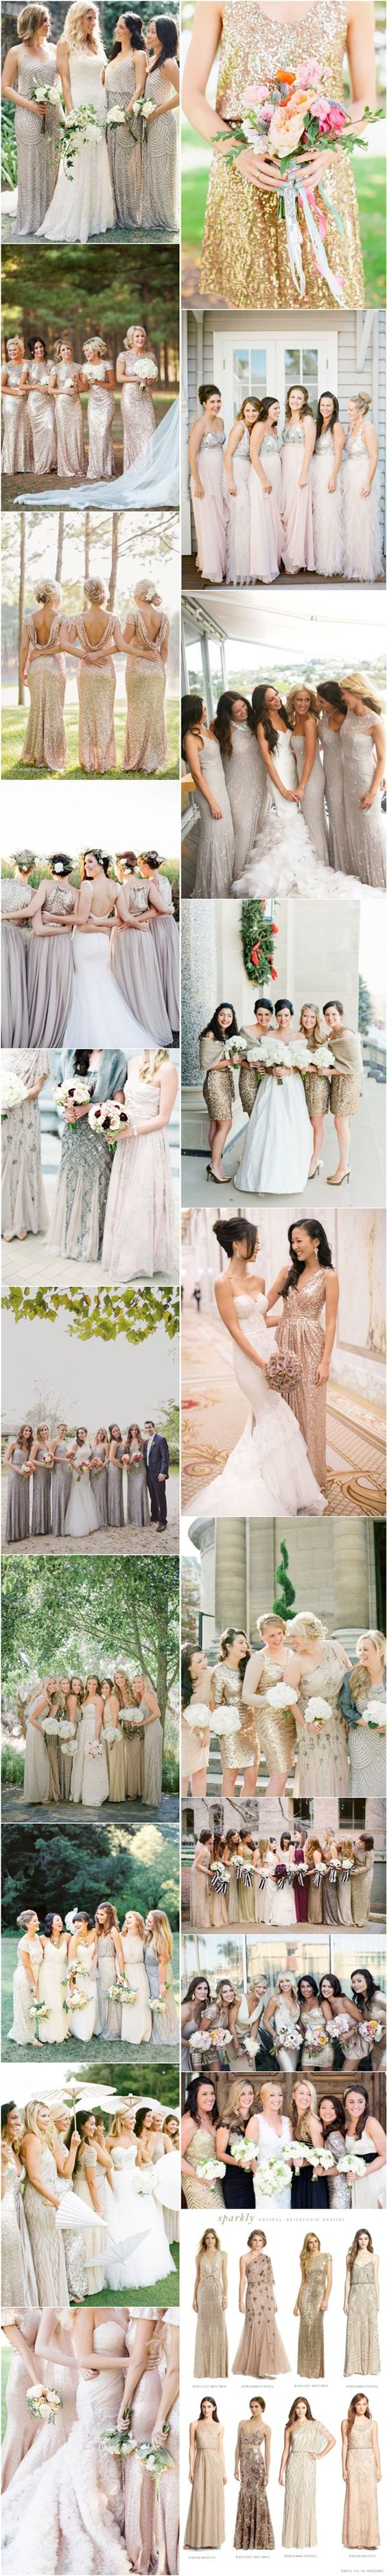 2015 Wedding Trends – Sequined and Metallic Bridesmaid Dresses   http://www.deerpearlflowers.com/2015-wedding-trends-sequined-metallic-bridesmaid-dresses/